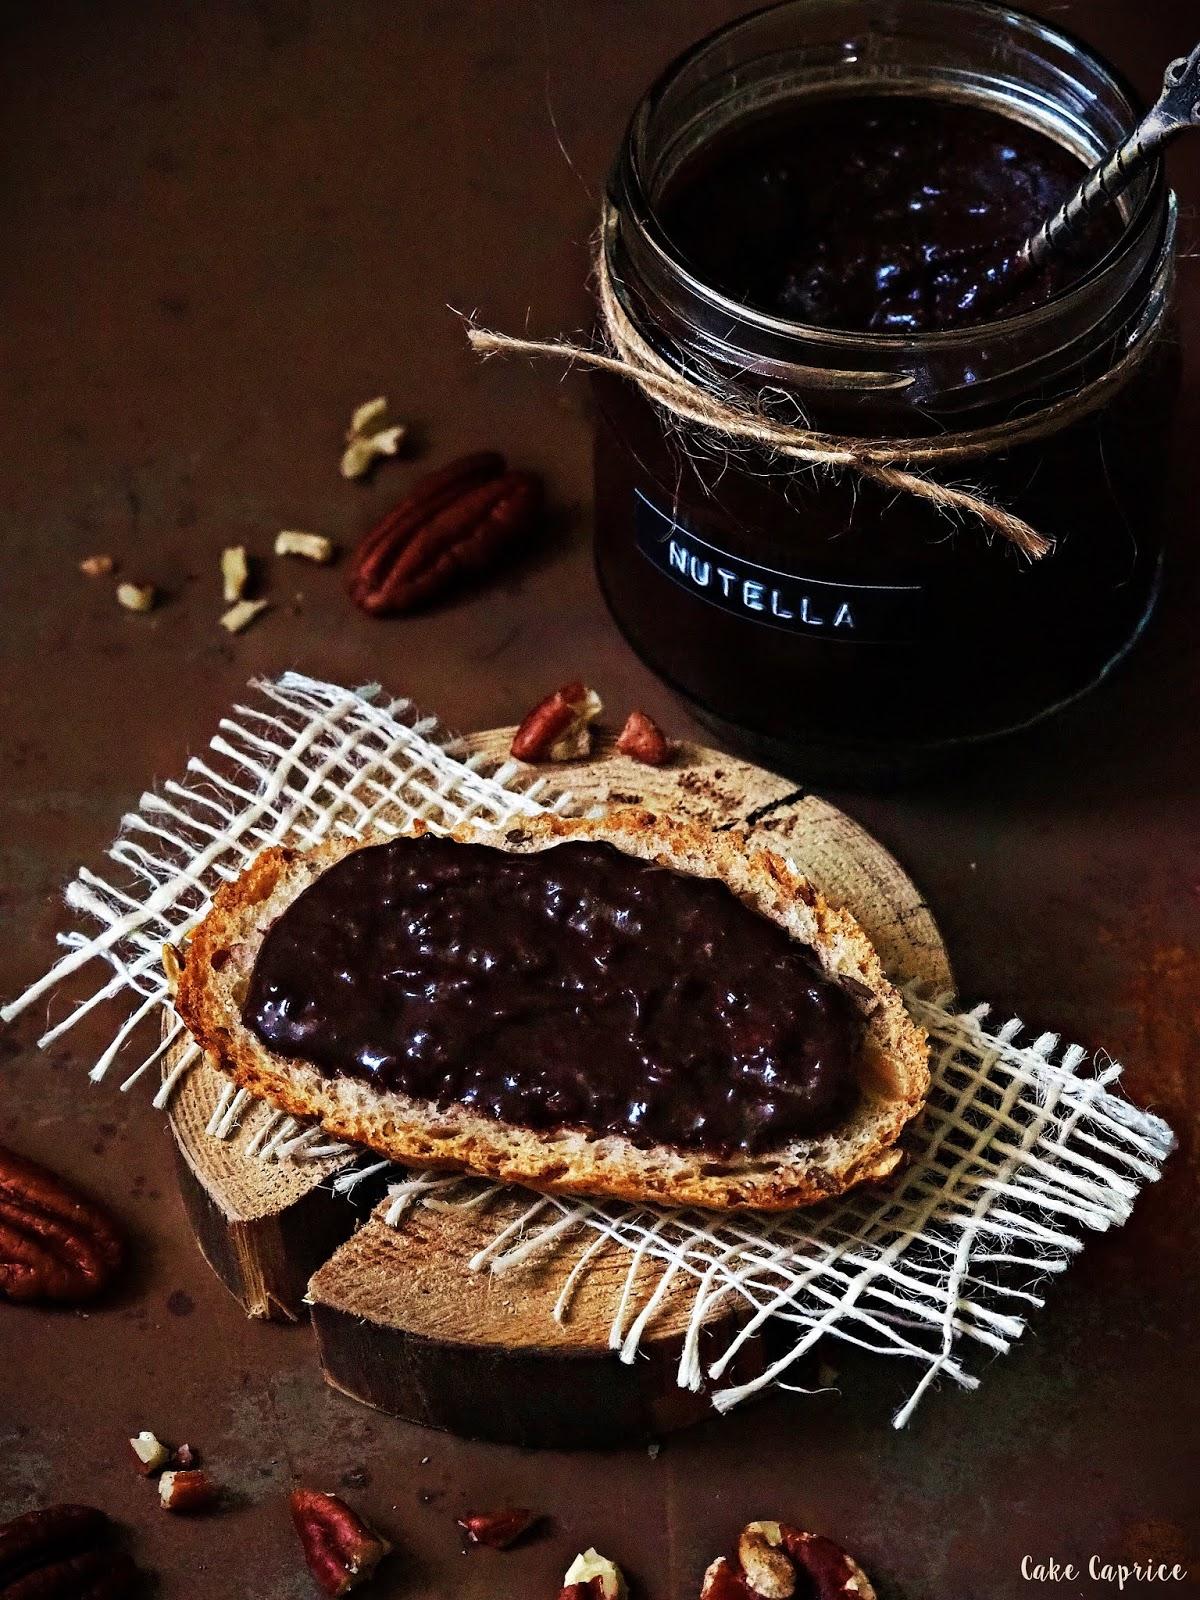 zdrowa Nutella